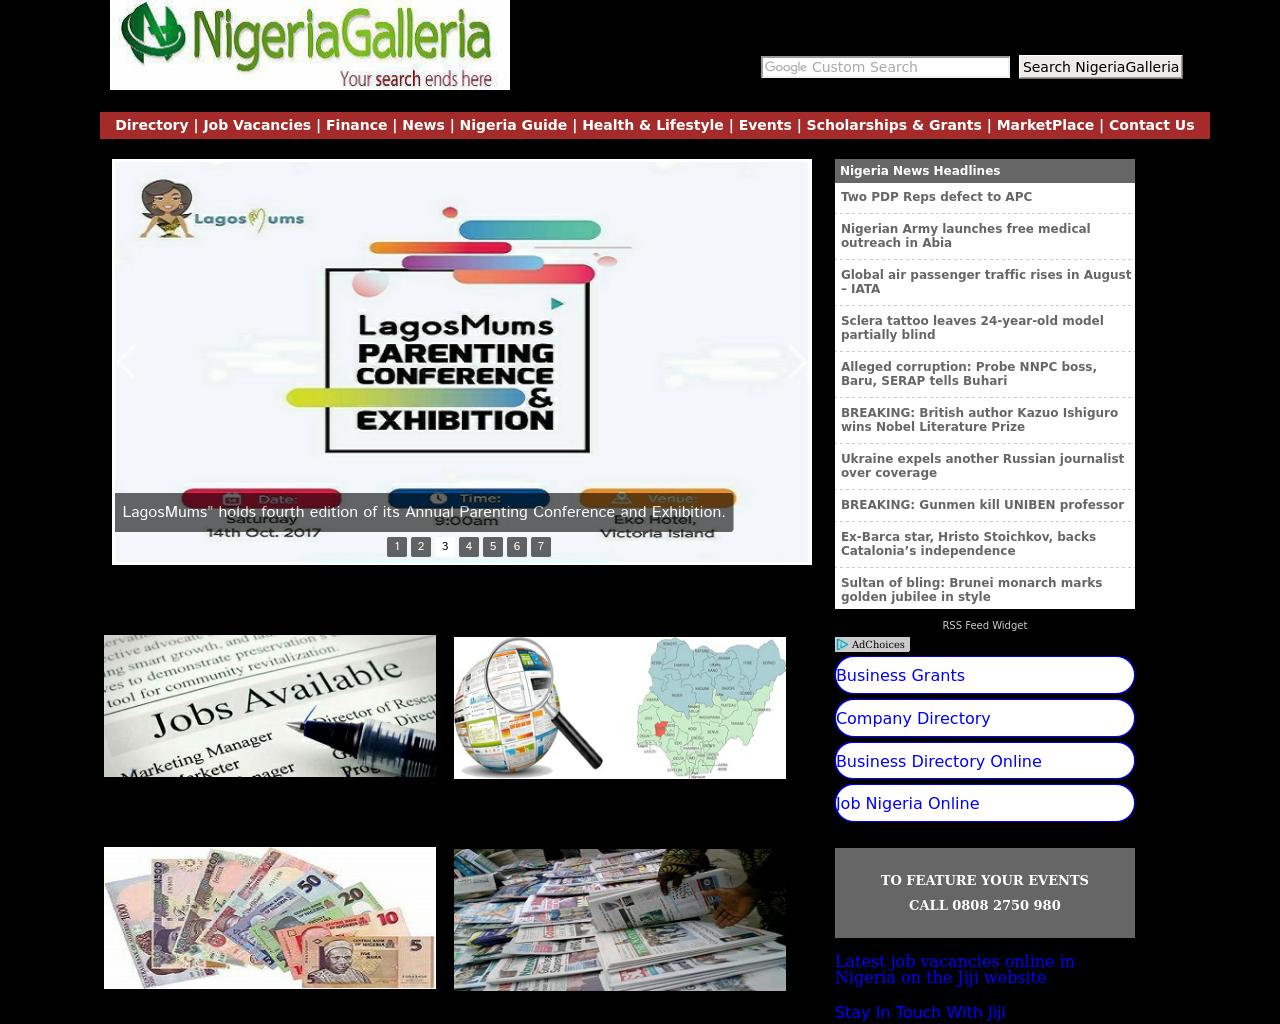 NigeriaGalleria-Advertising-Reviews-Pricing